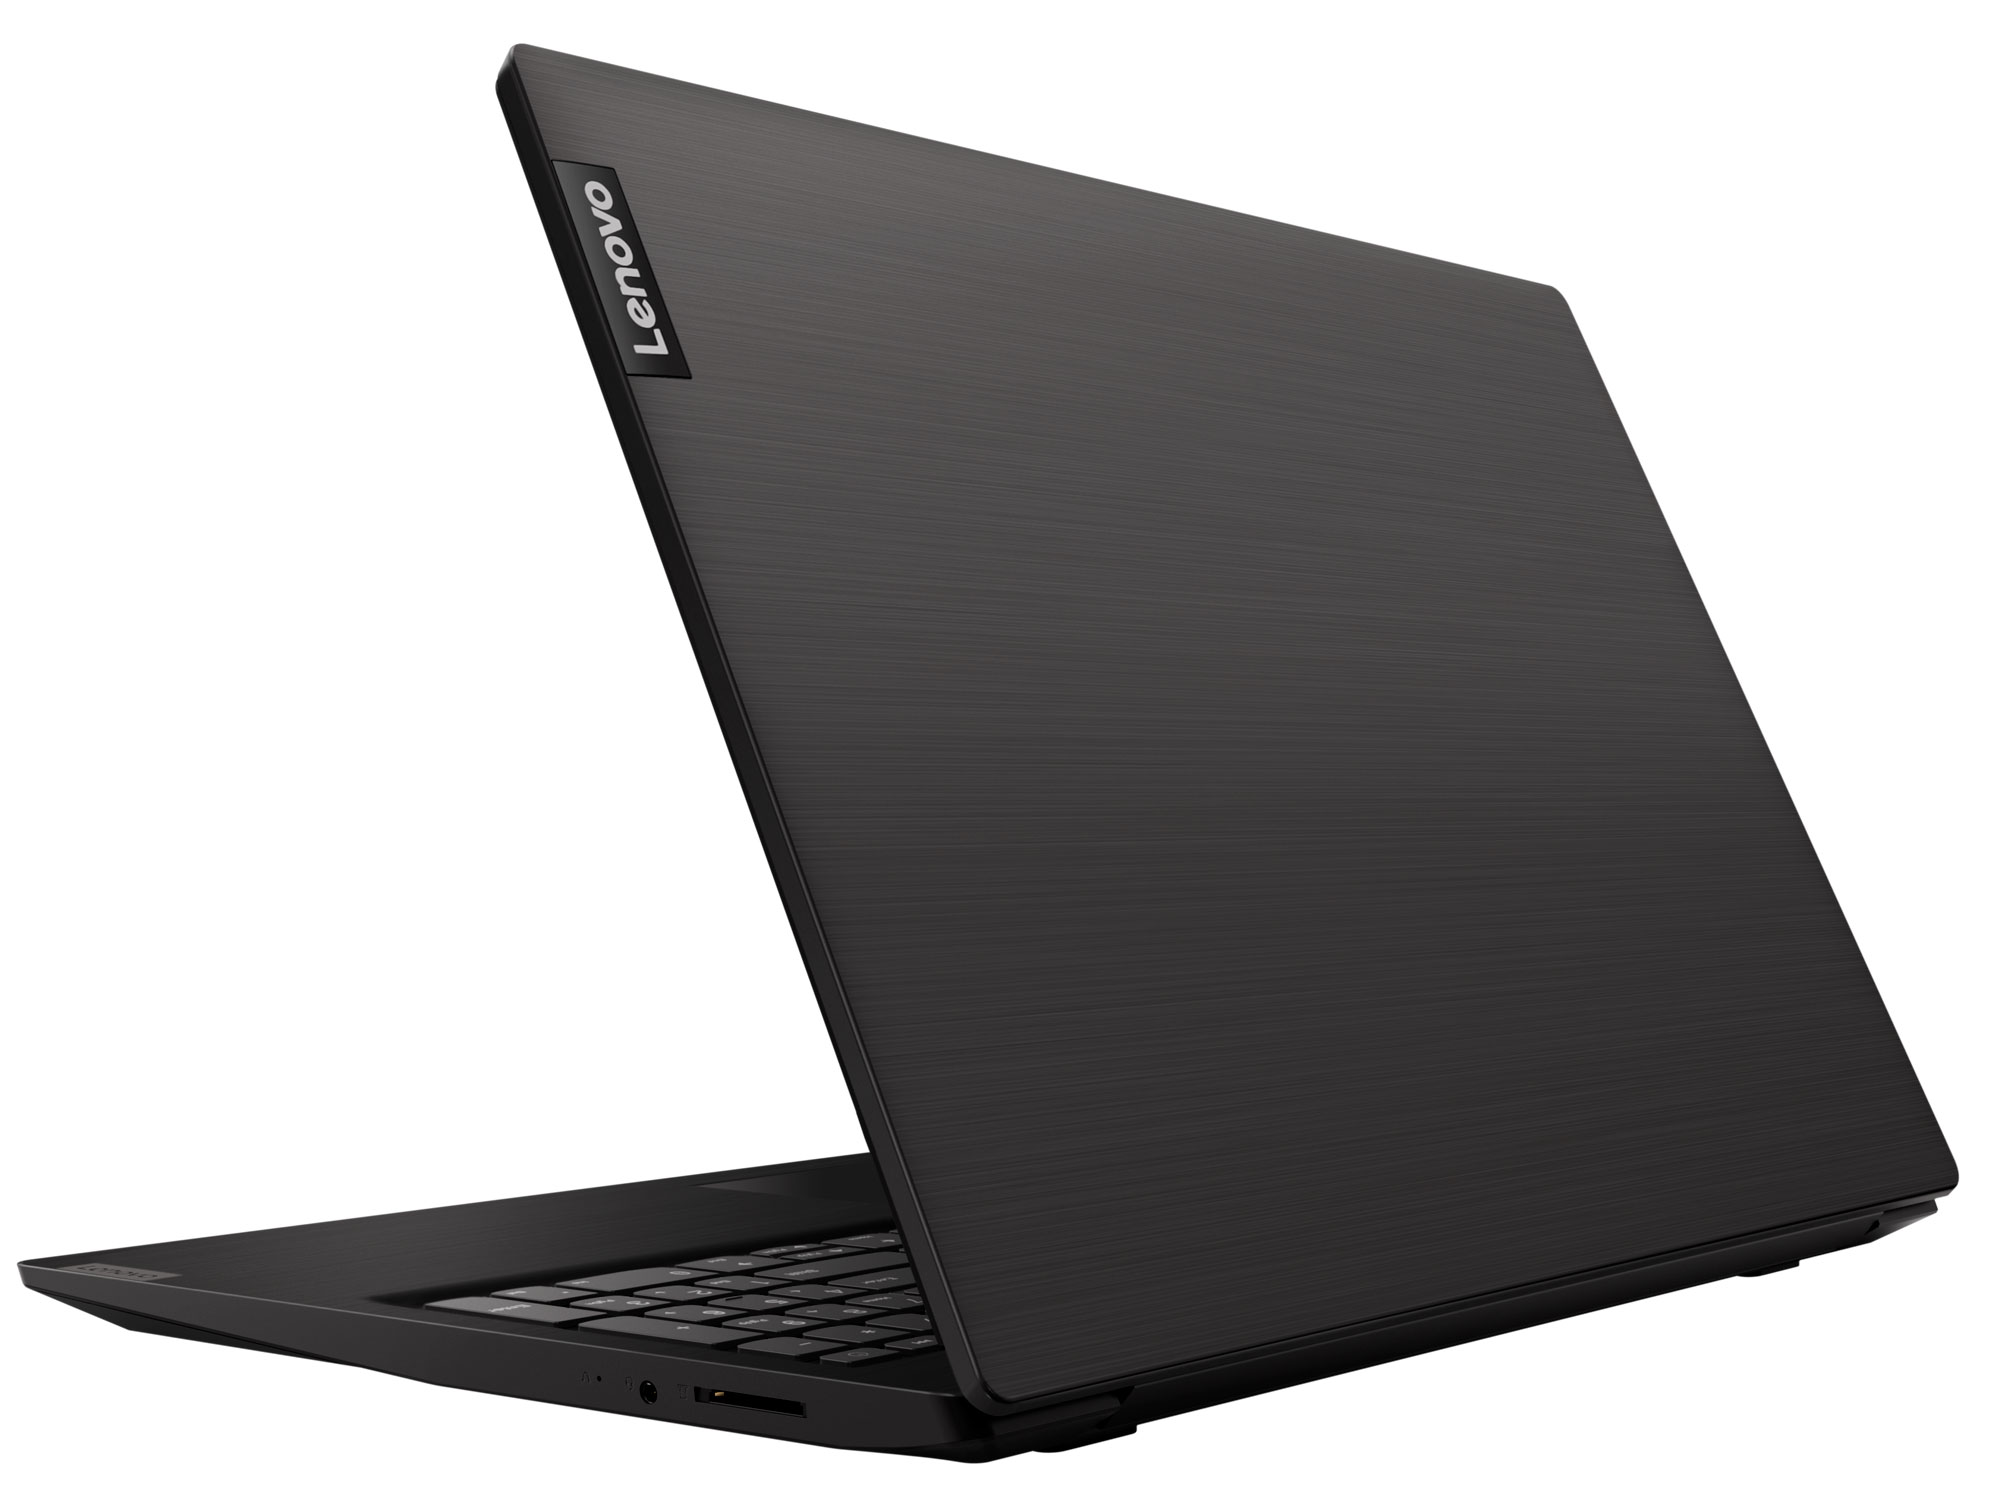 Фото  Ноутбук Lenovo ideapad S145-15IWL Black (81MV0191RK)